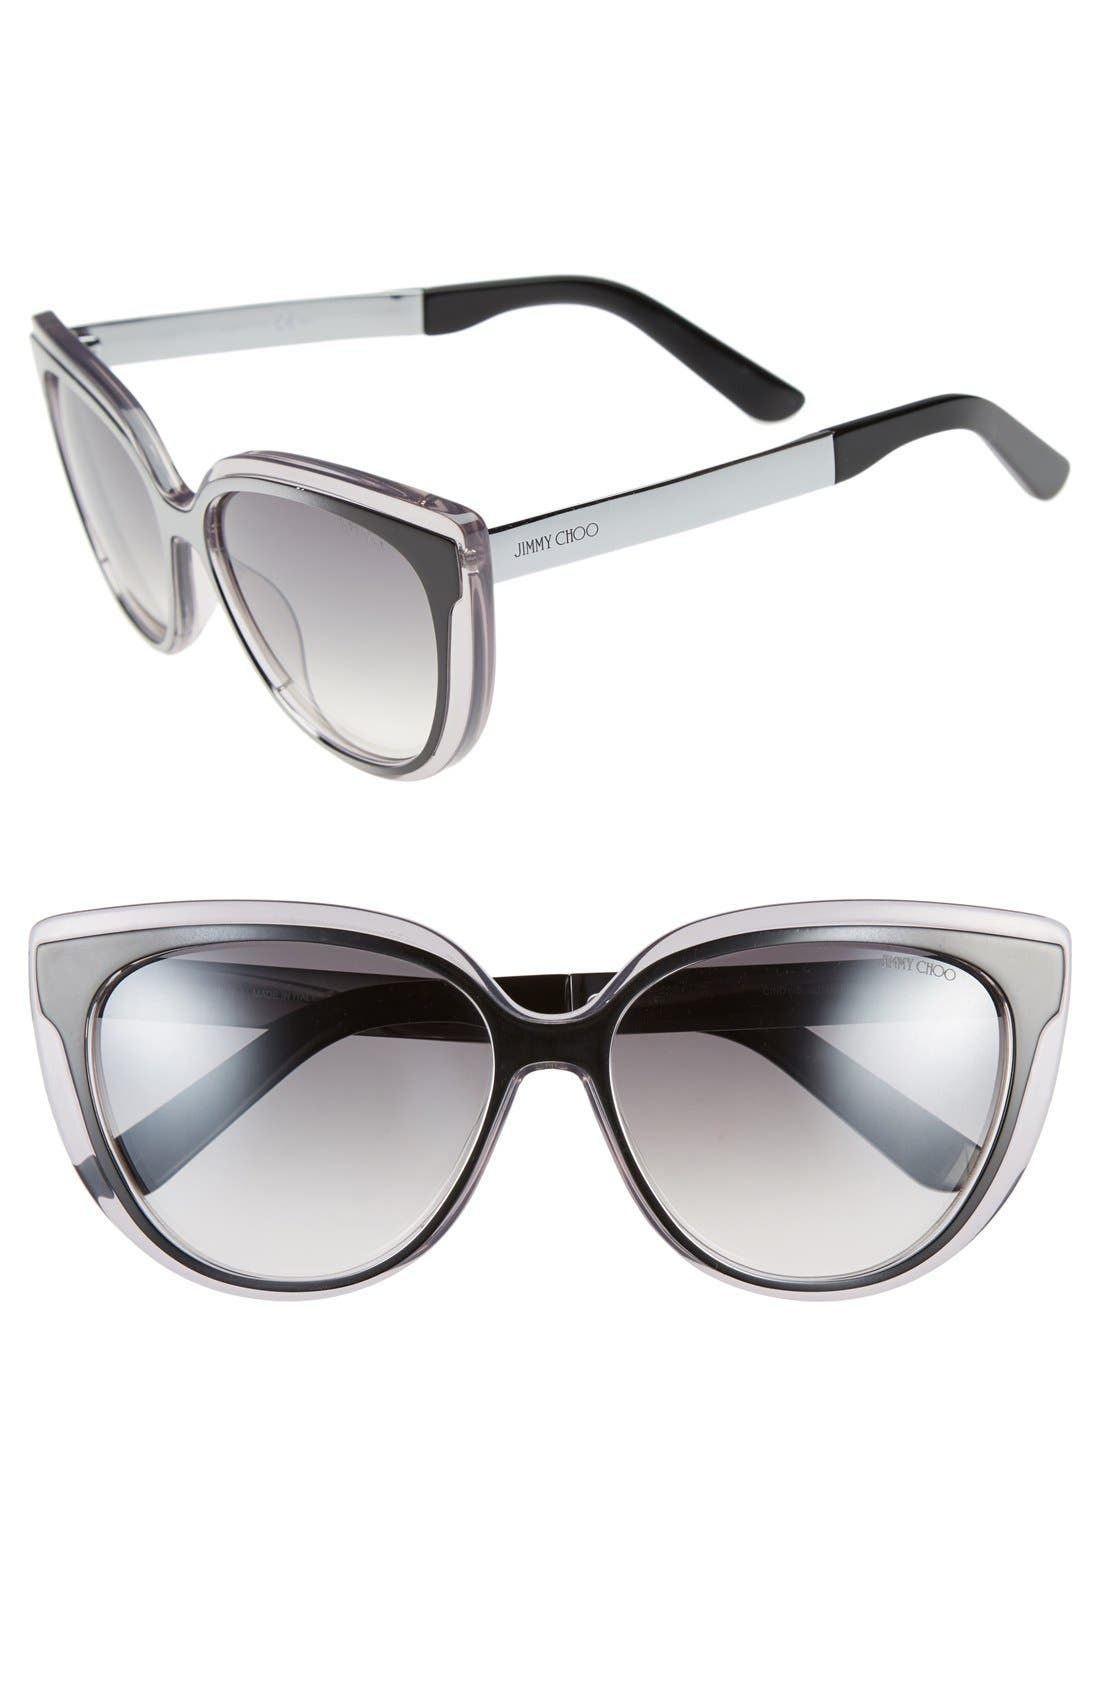 Main Image - Jimmy Choo 'Cindy' 57mm Retro Sunglasses